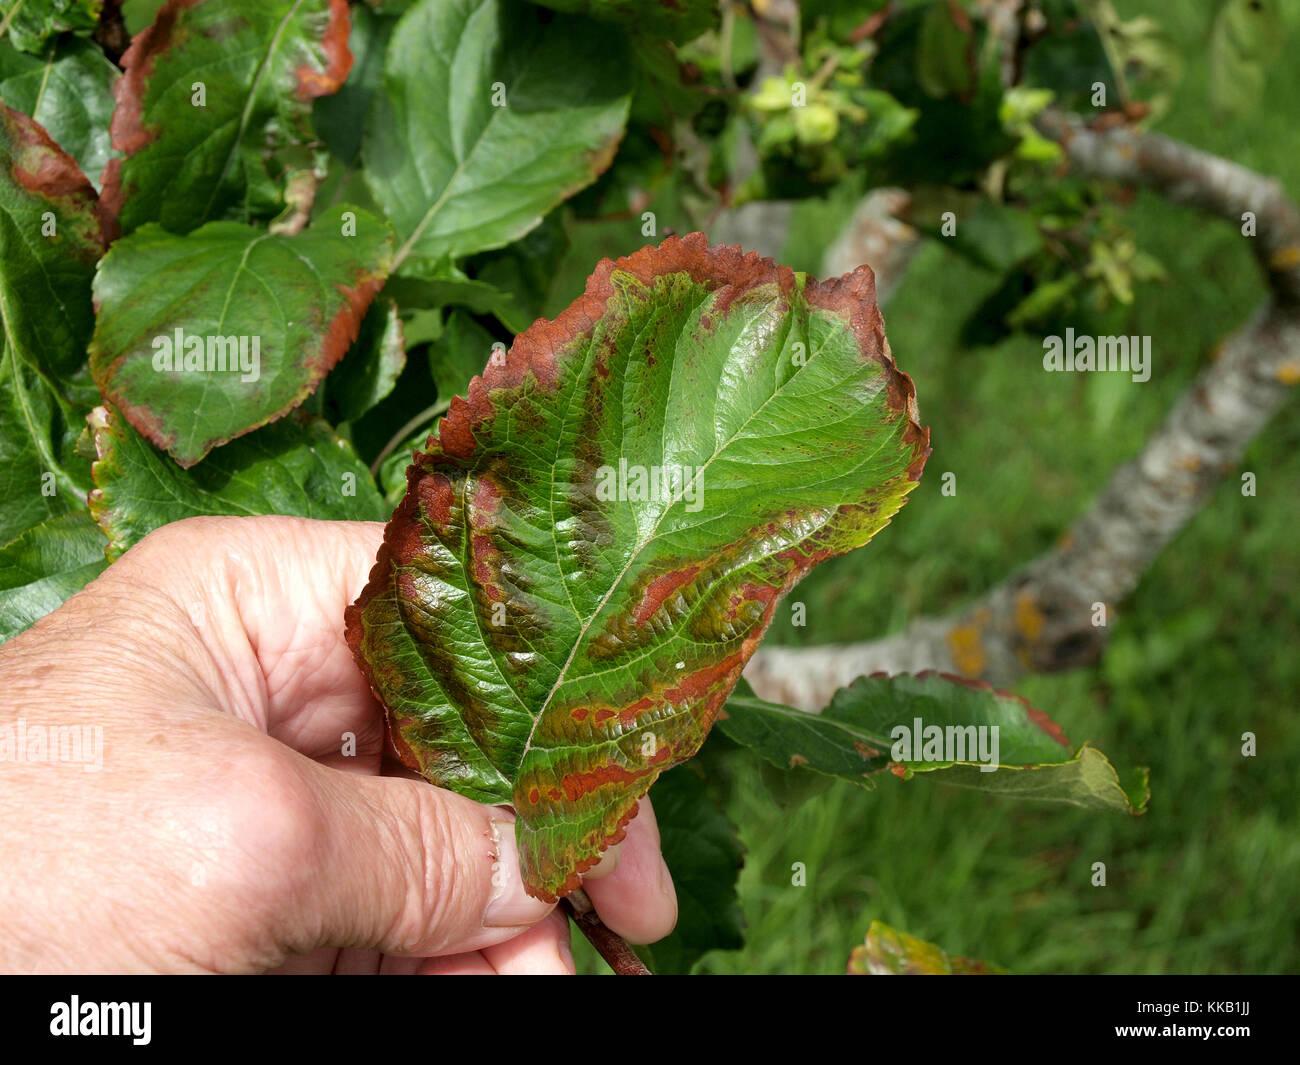 Apple Tree Leaf Disease Pictures